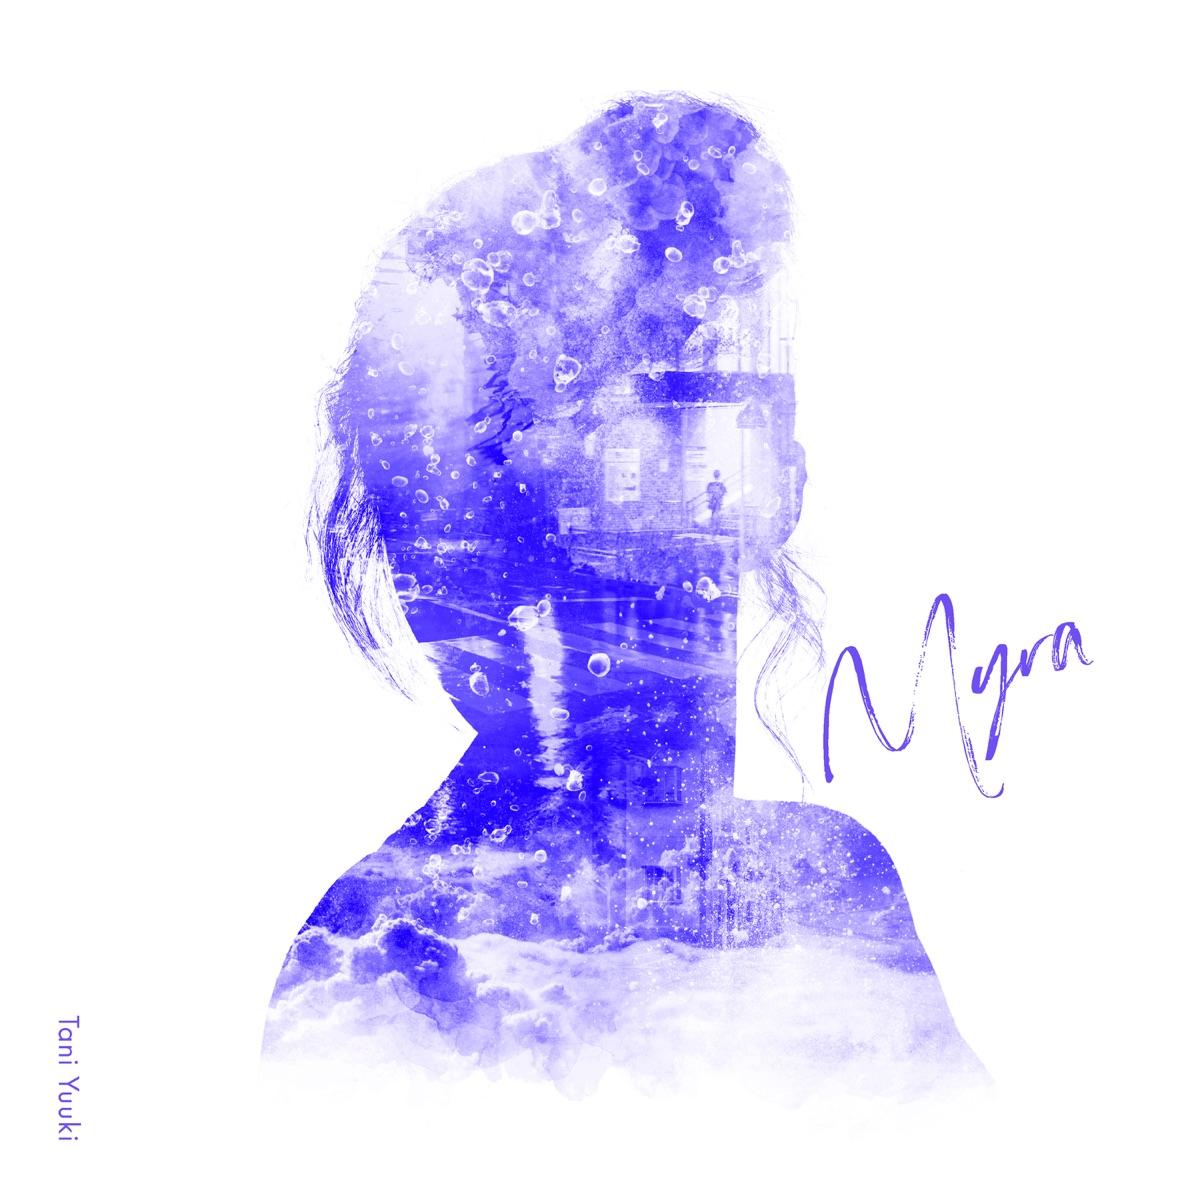 『Tani YuukiMyra』収録の『Myra』ジャケット